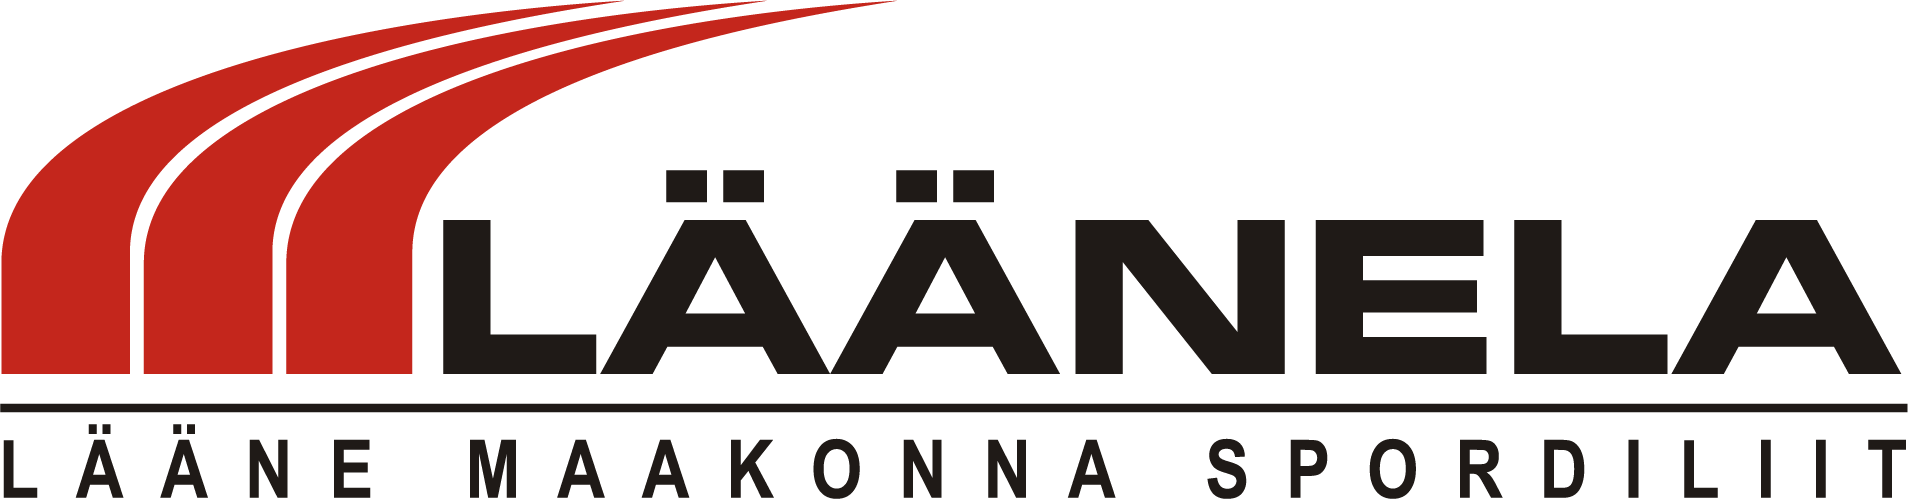 Läänela logo